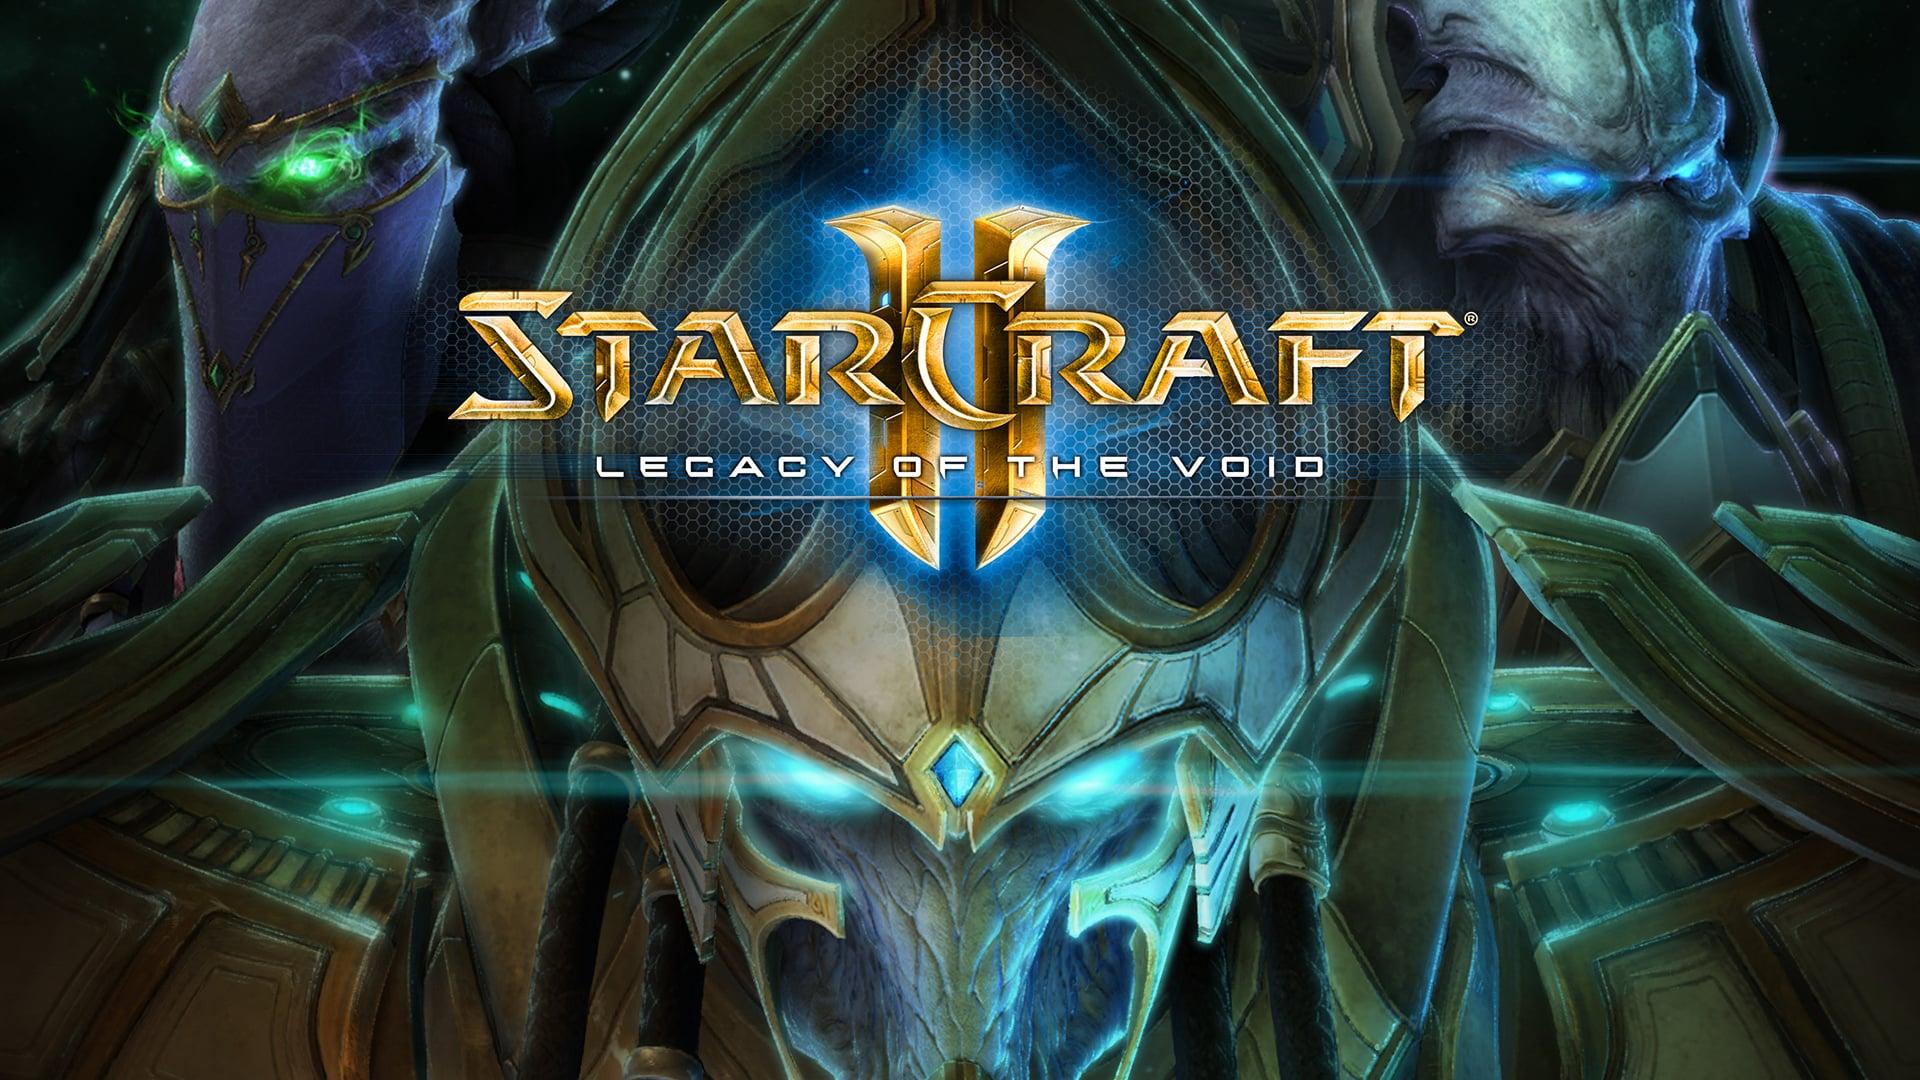 StarCraft II: Legacy of the Void telecharger gratuit de PC et Torrent